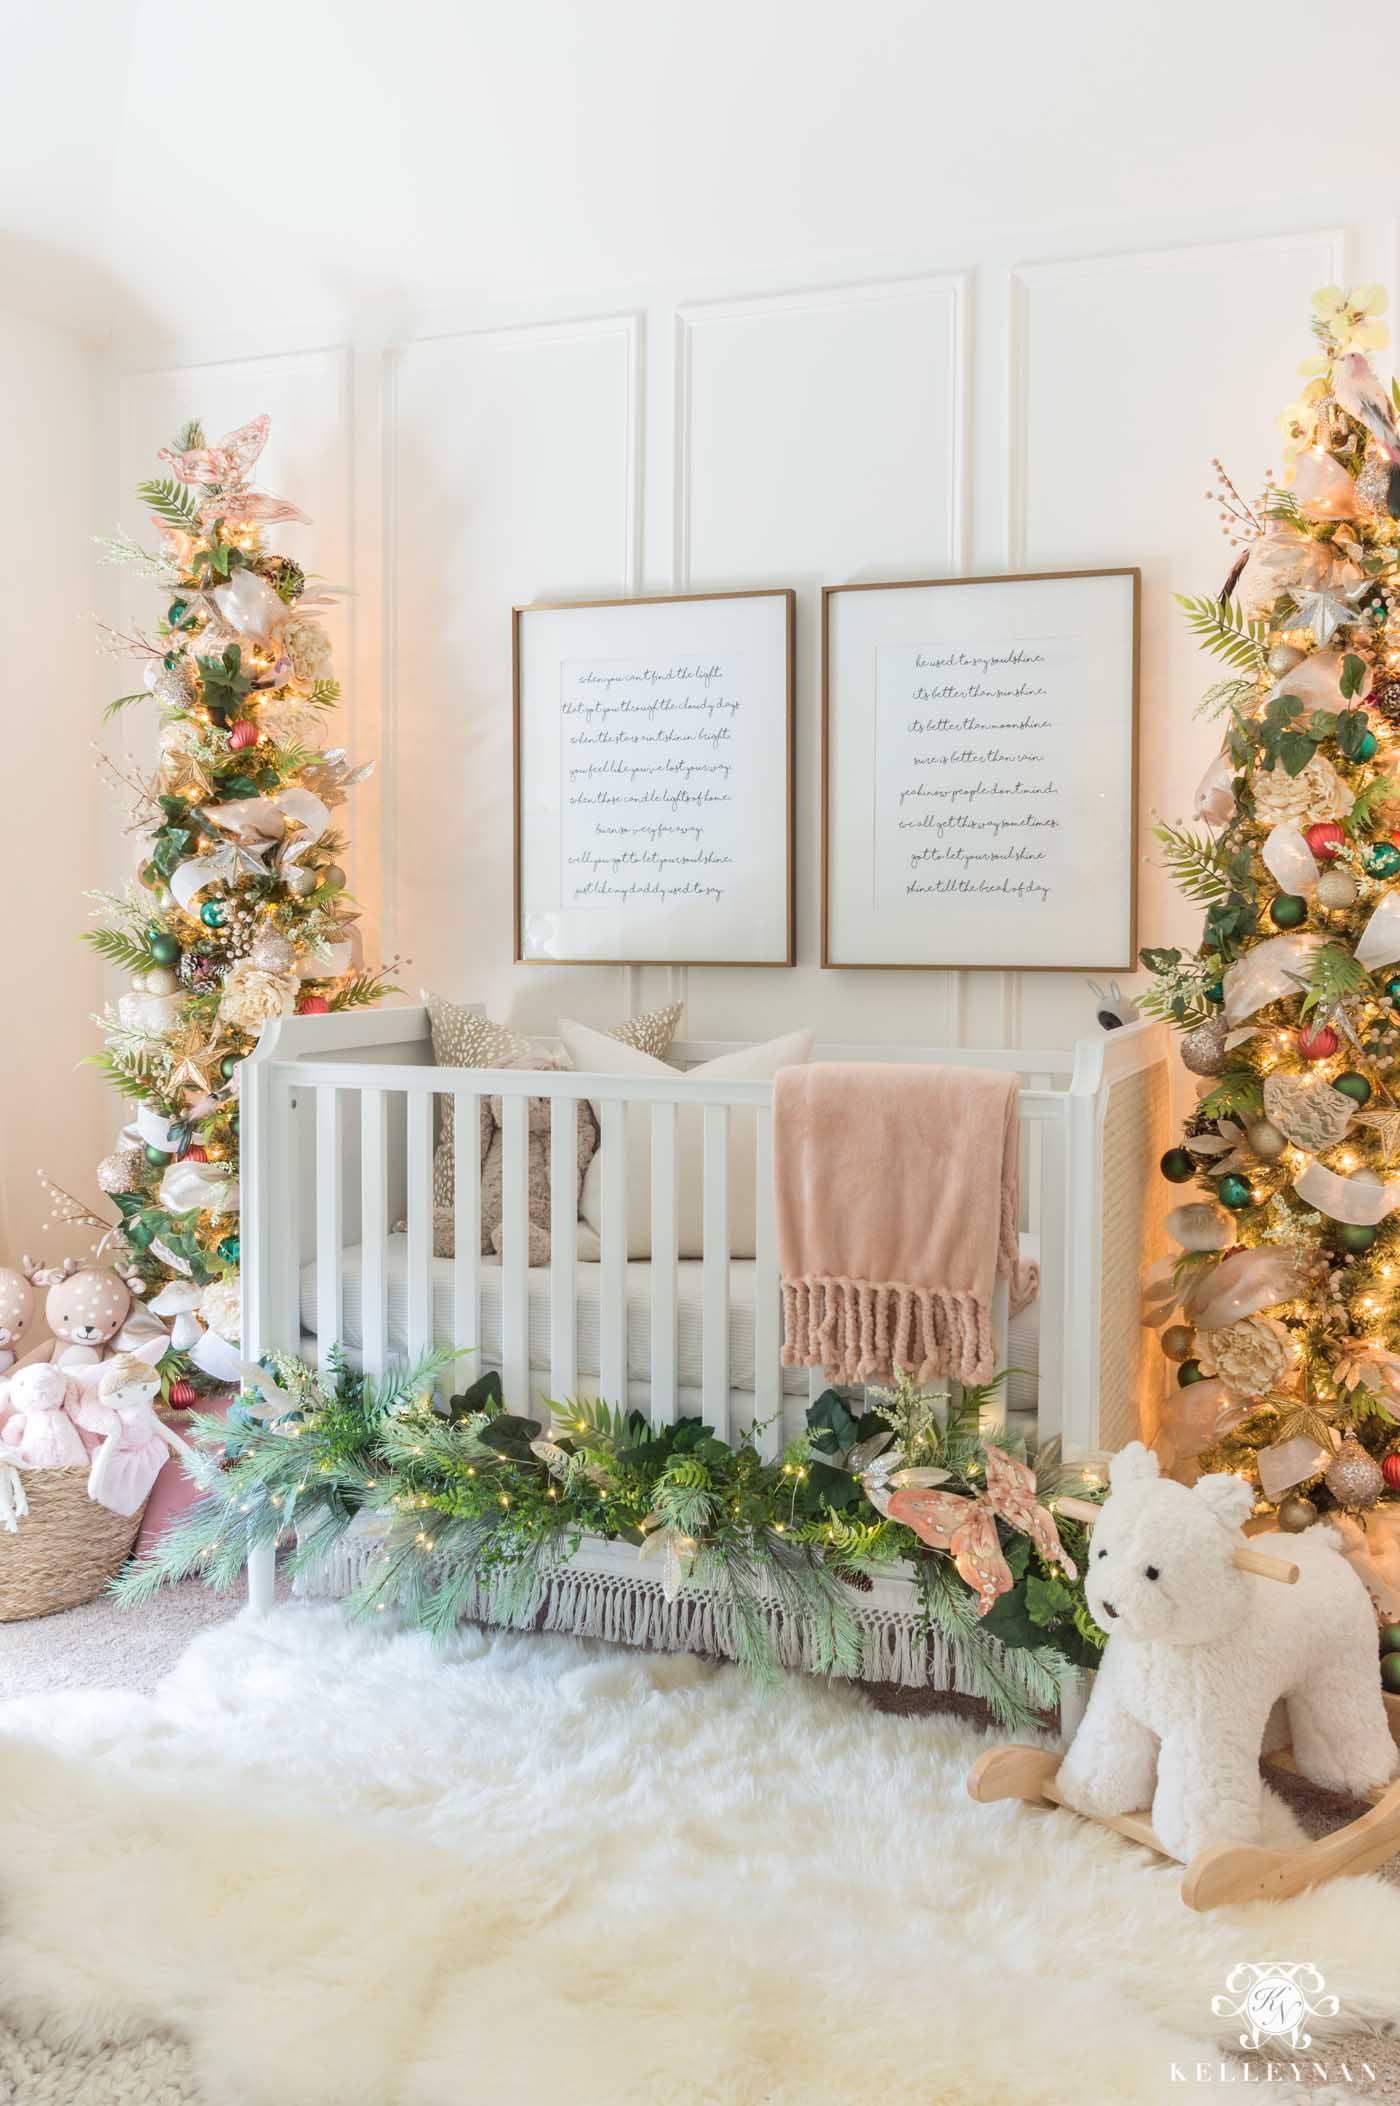 Baby Nursery Christmas Trees Flanking the Crib